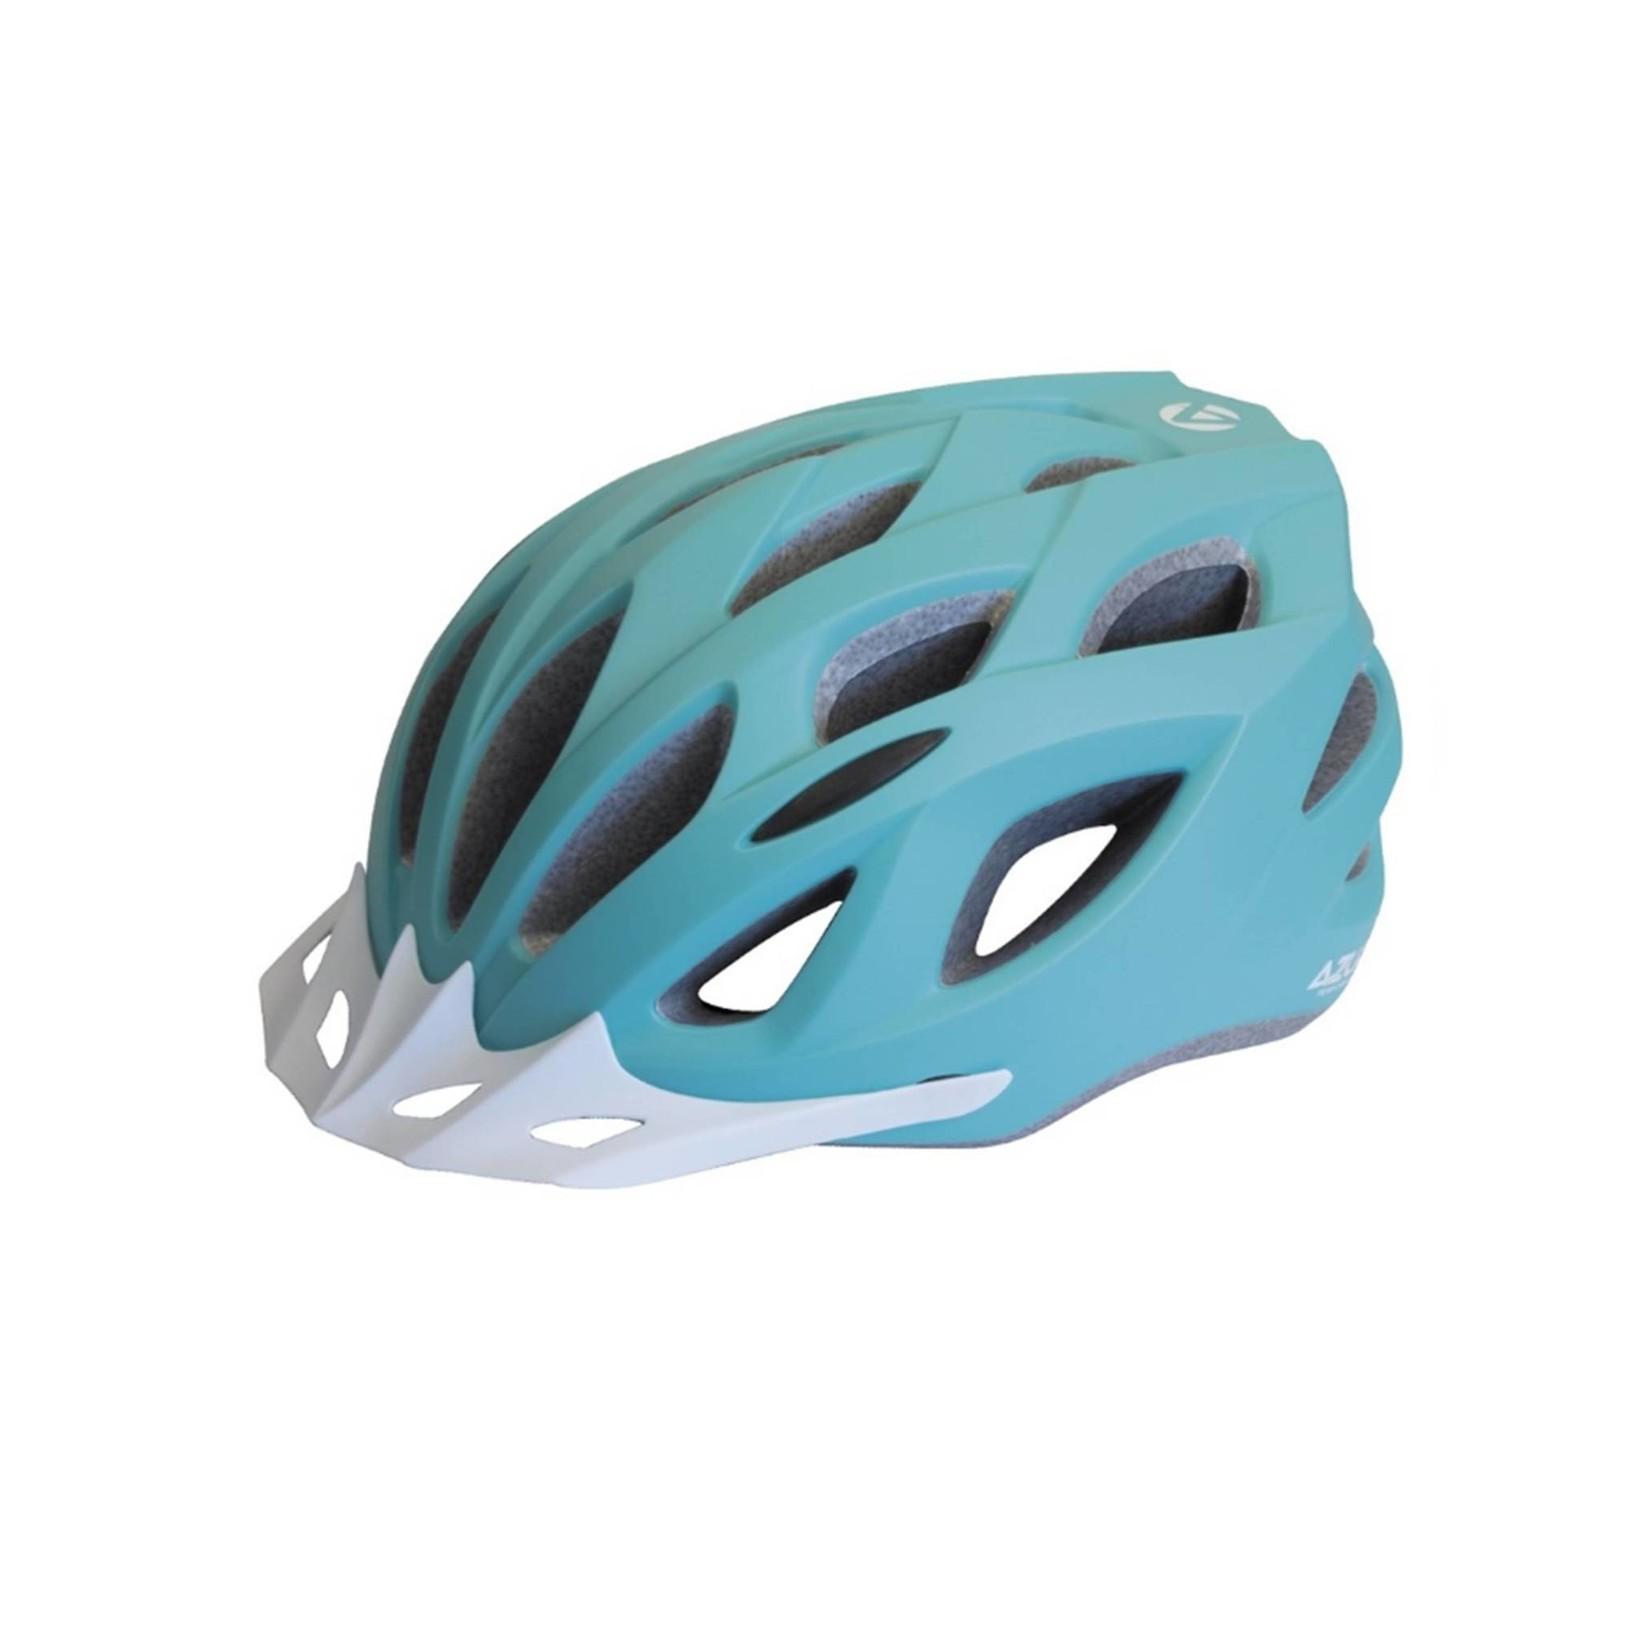 Azur L61 Matt Teal Helmet